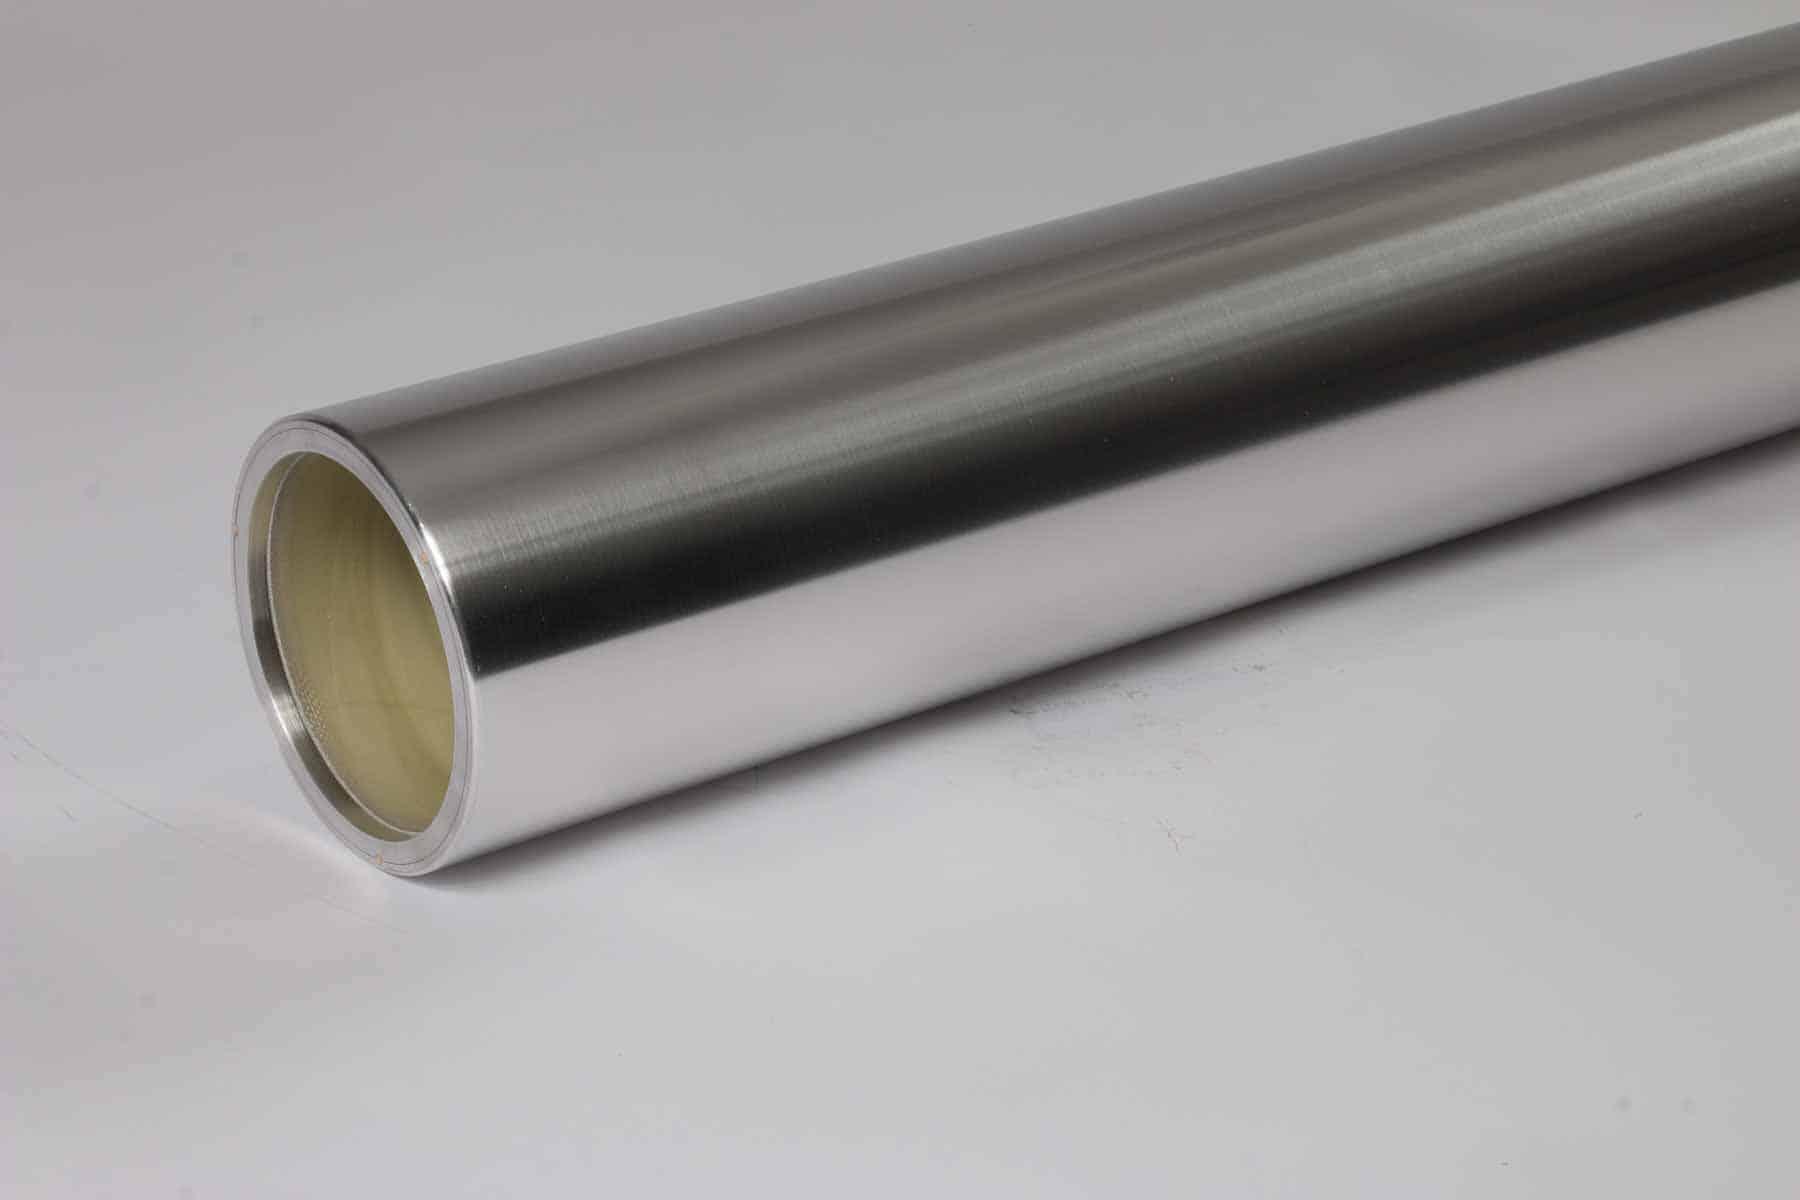 MECA Leads in VSOP Plate and Blanket Sleeves Manufacturing